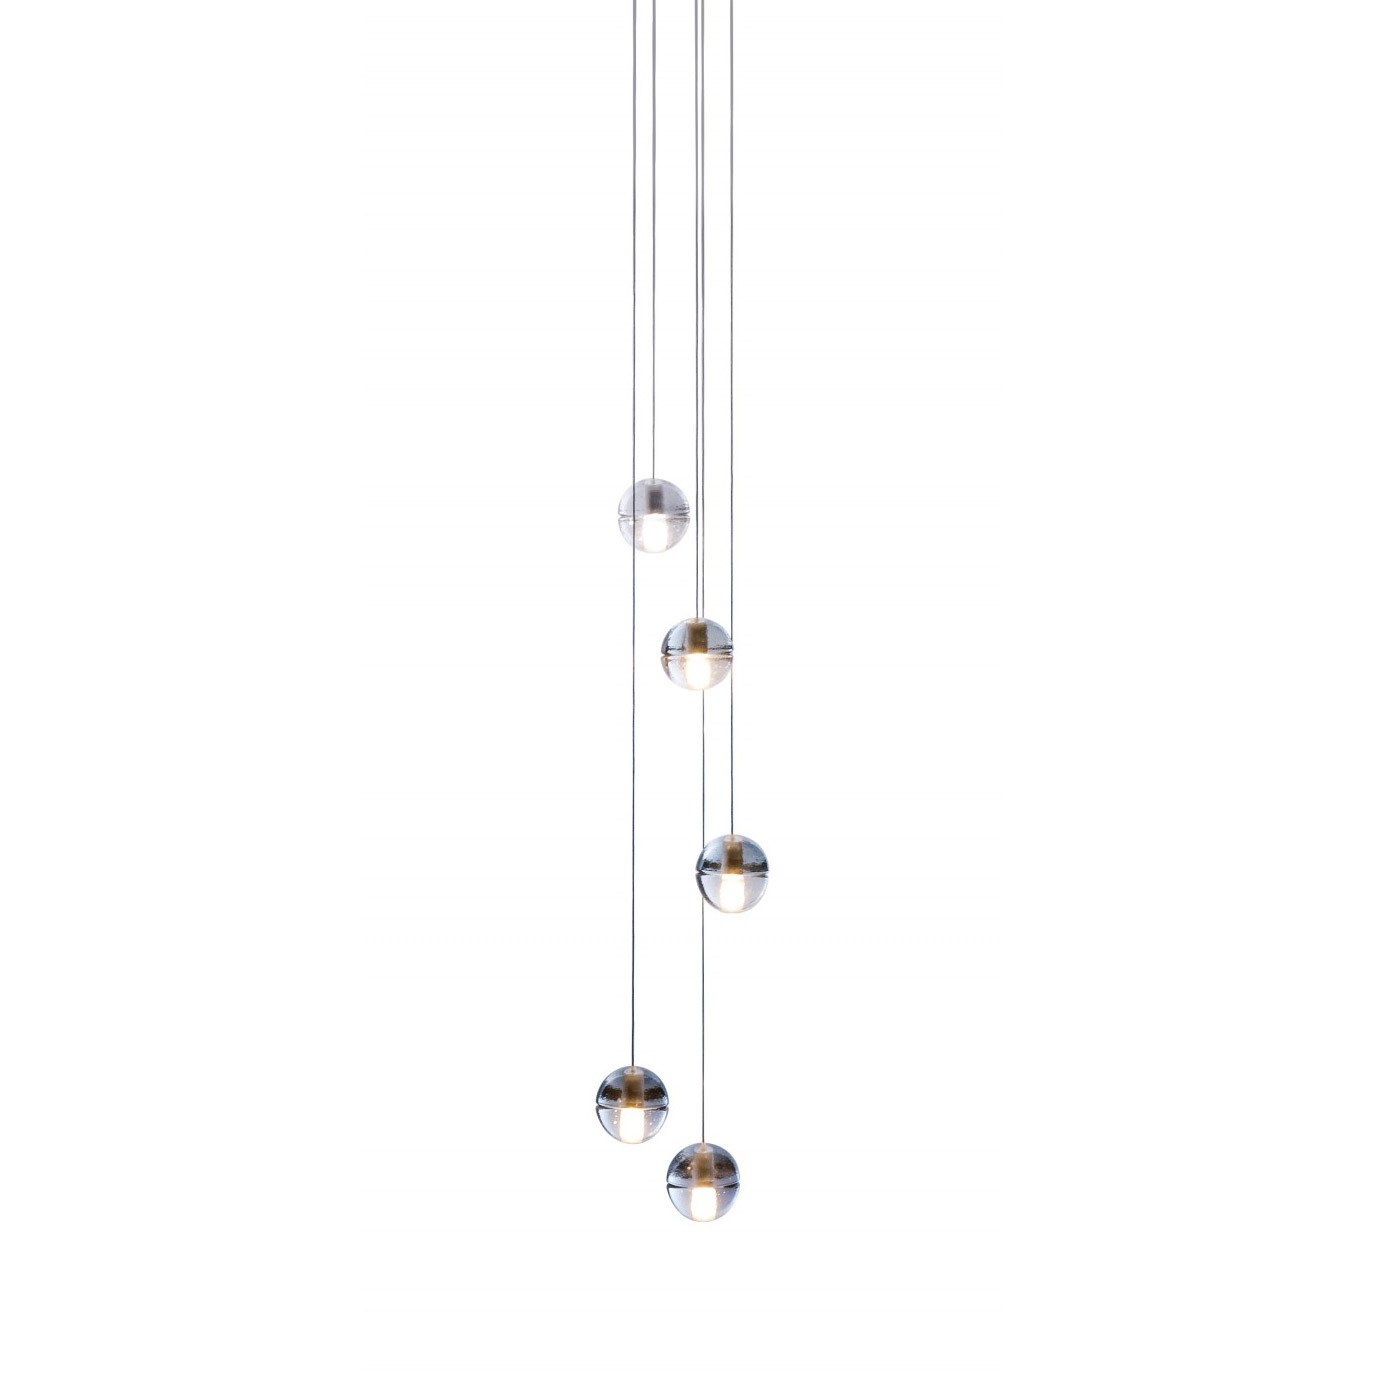 Bocci 14.5 LED Pendelleuchte